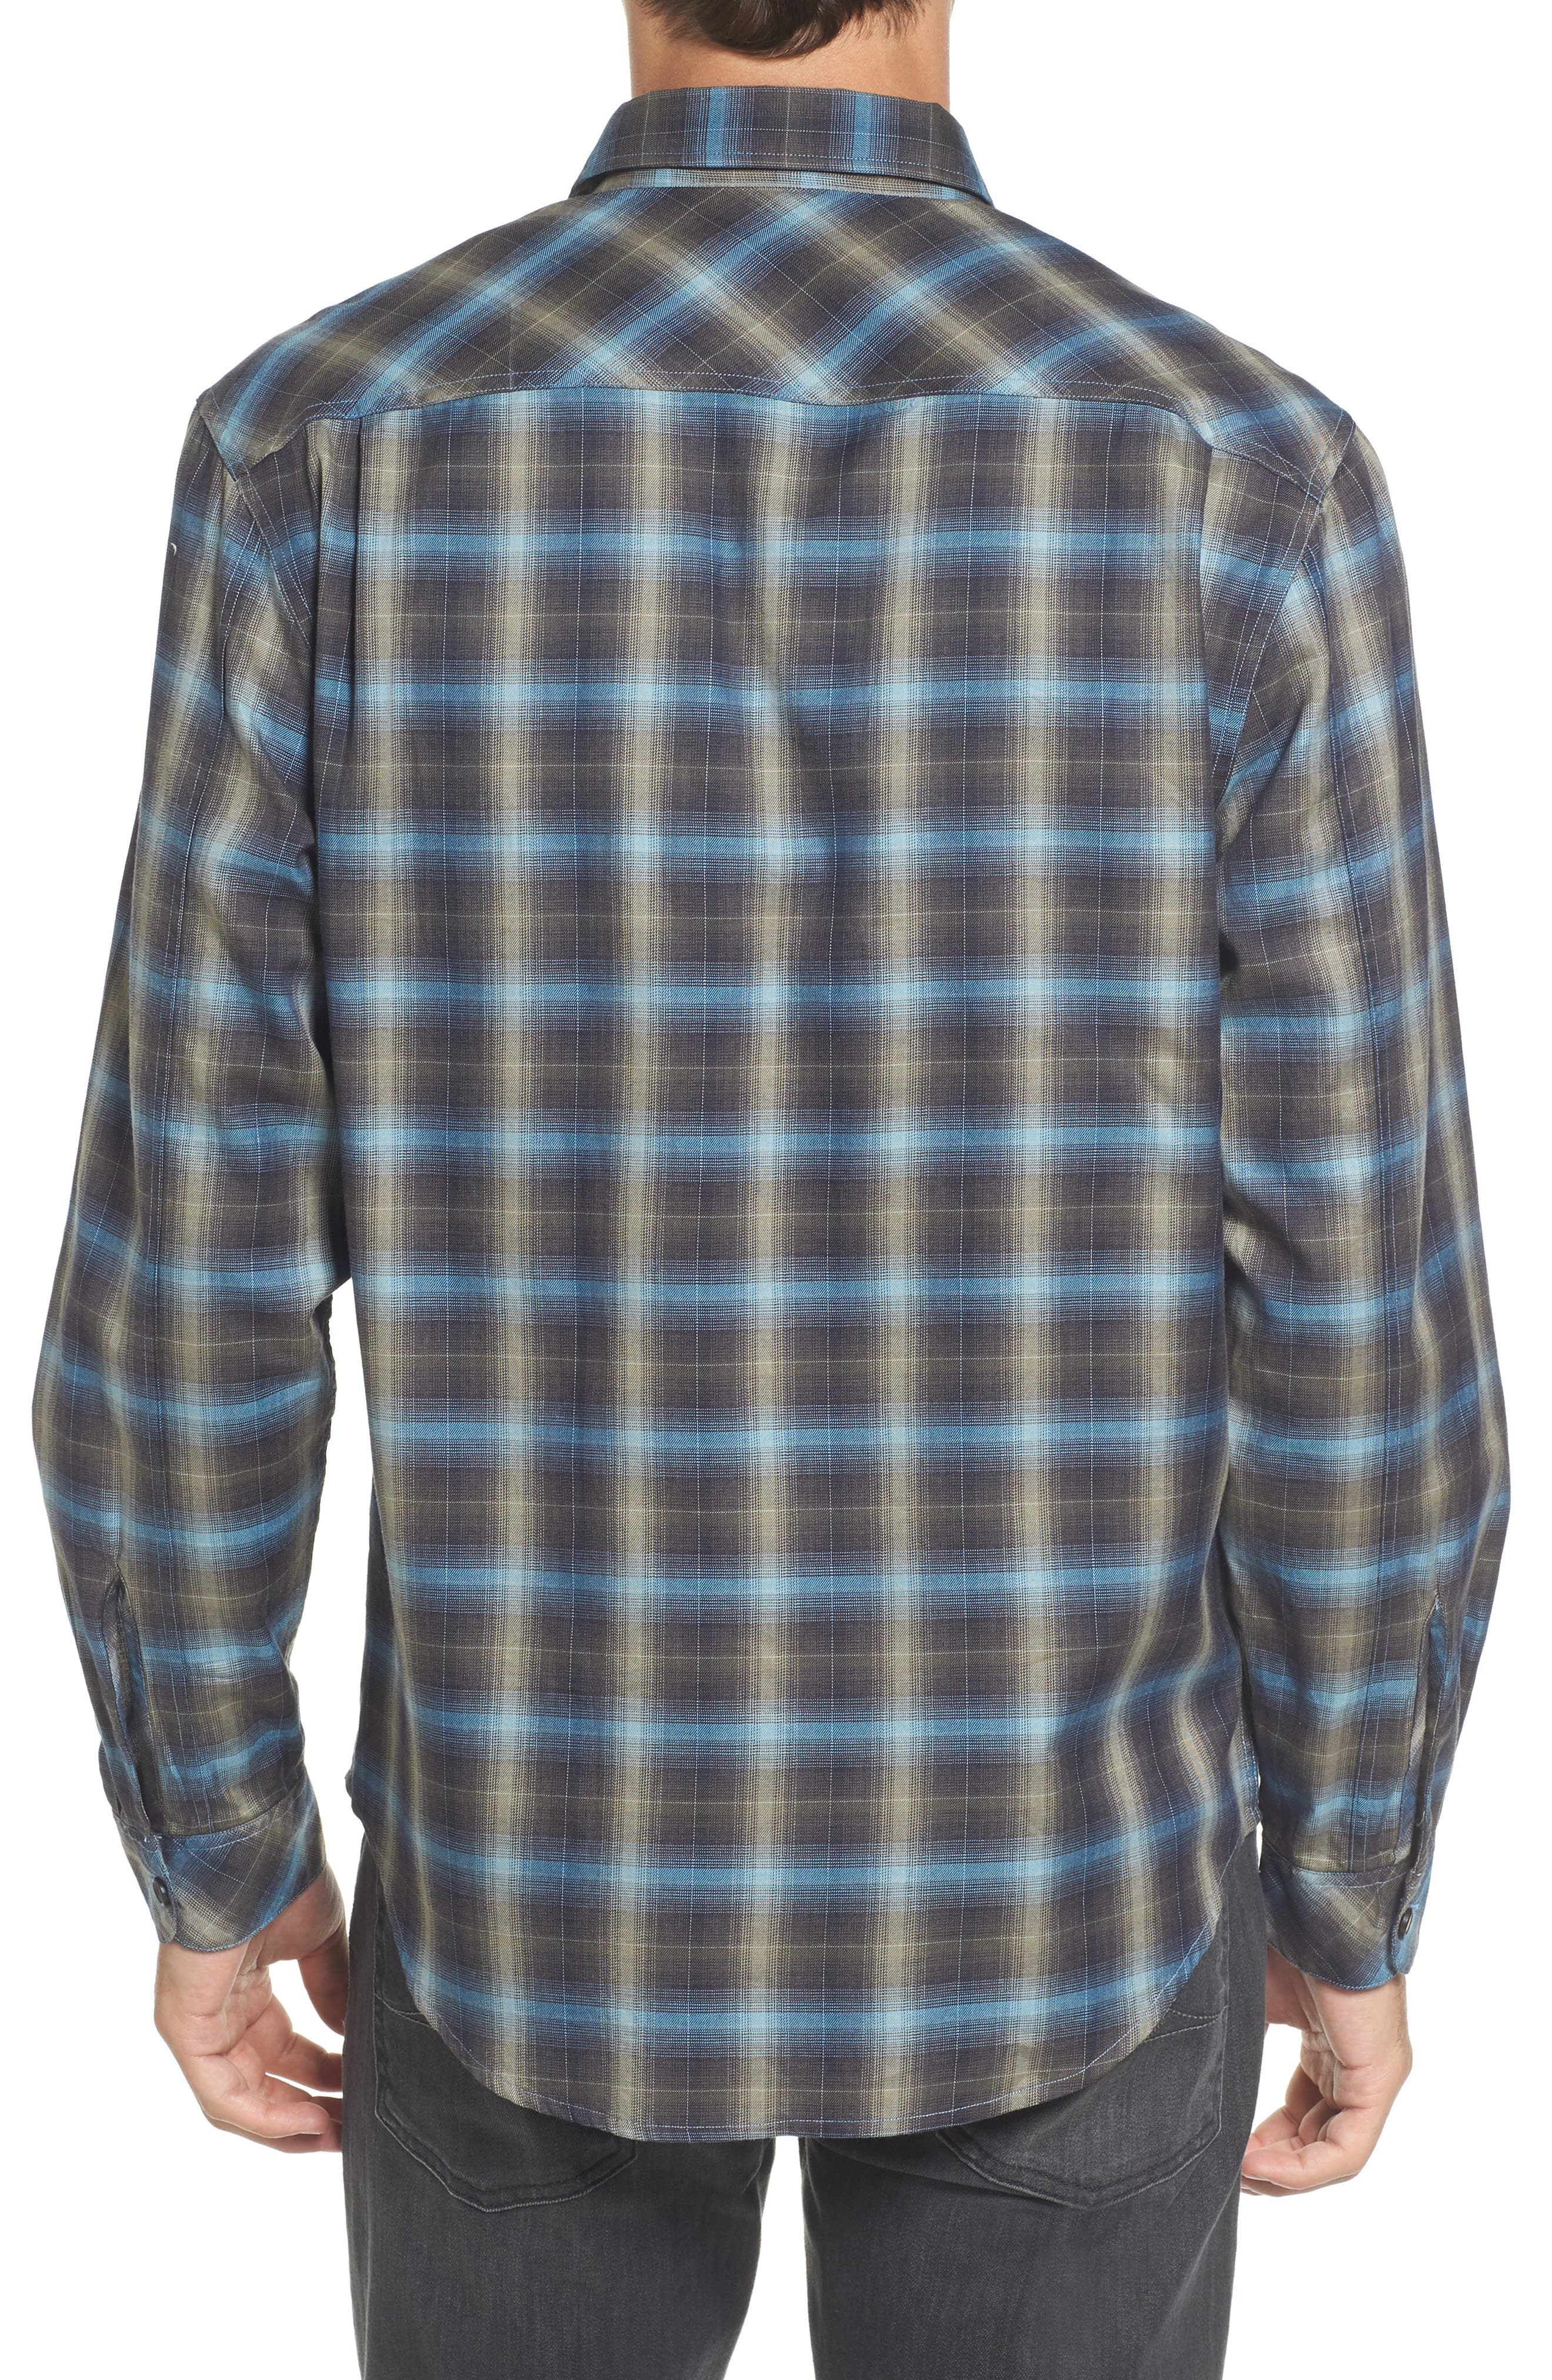 Alternate Image 2  - Coastaoro Walnut Plaid Garment Washed Flannel Shirt